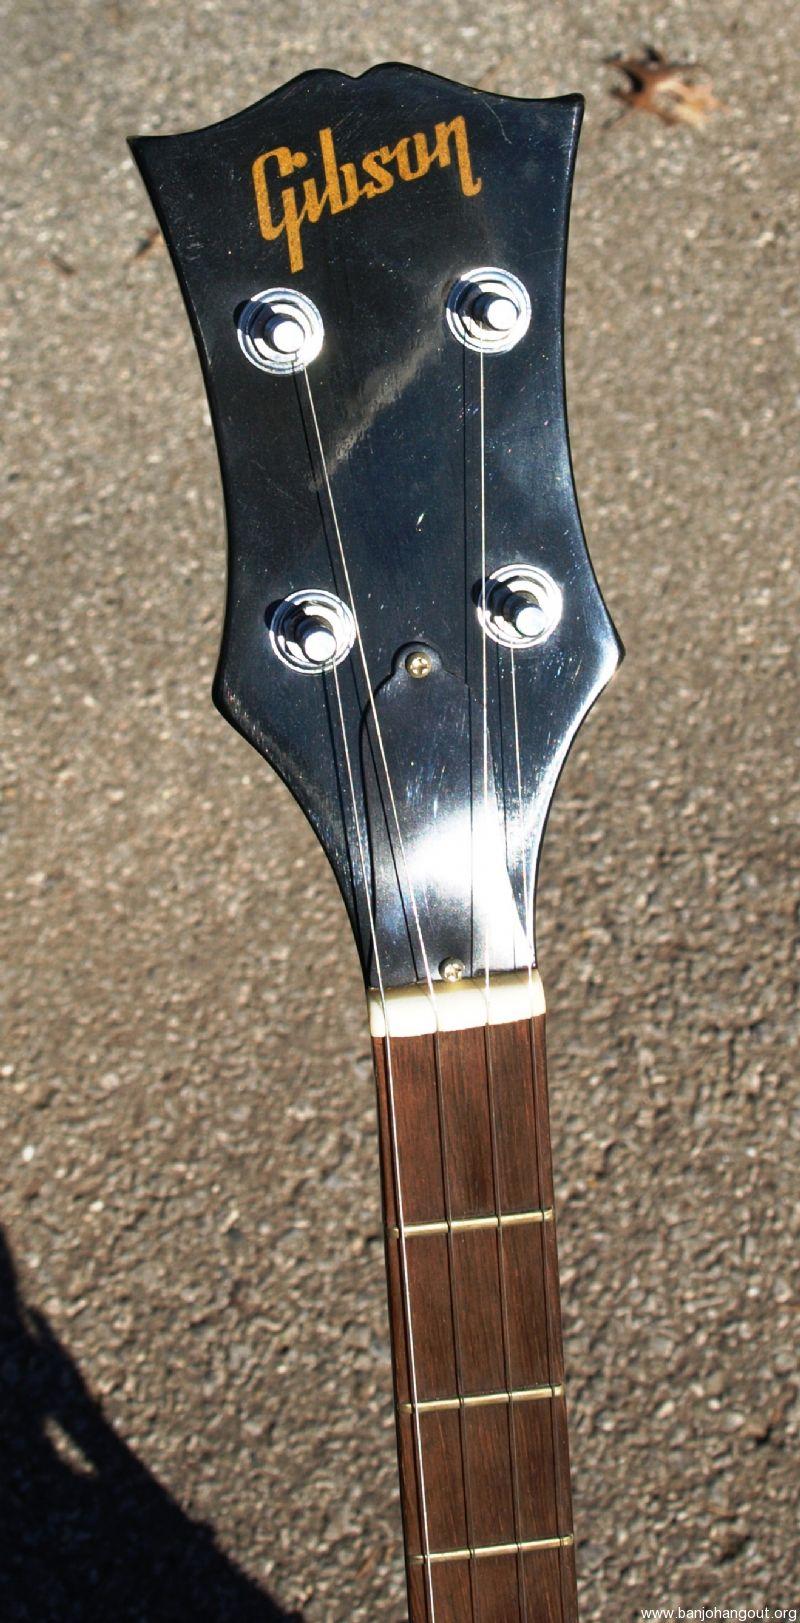 Gibson RB-175 Long neck - Used Banjo For Sale at BanjoBuyer com